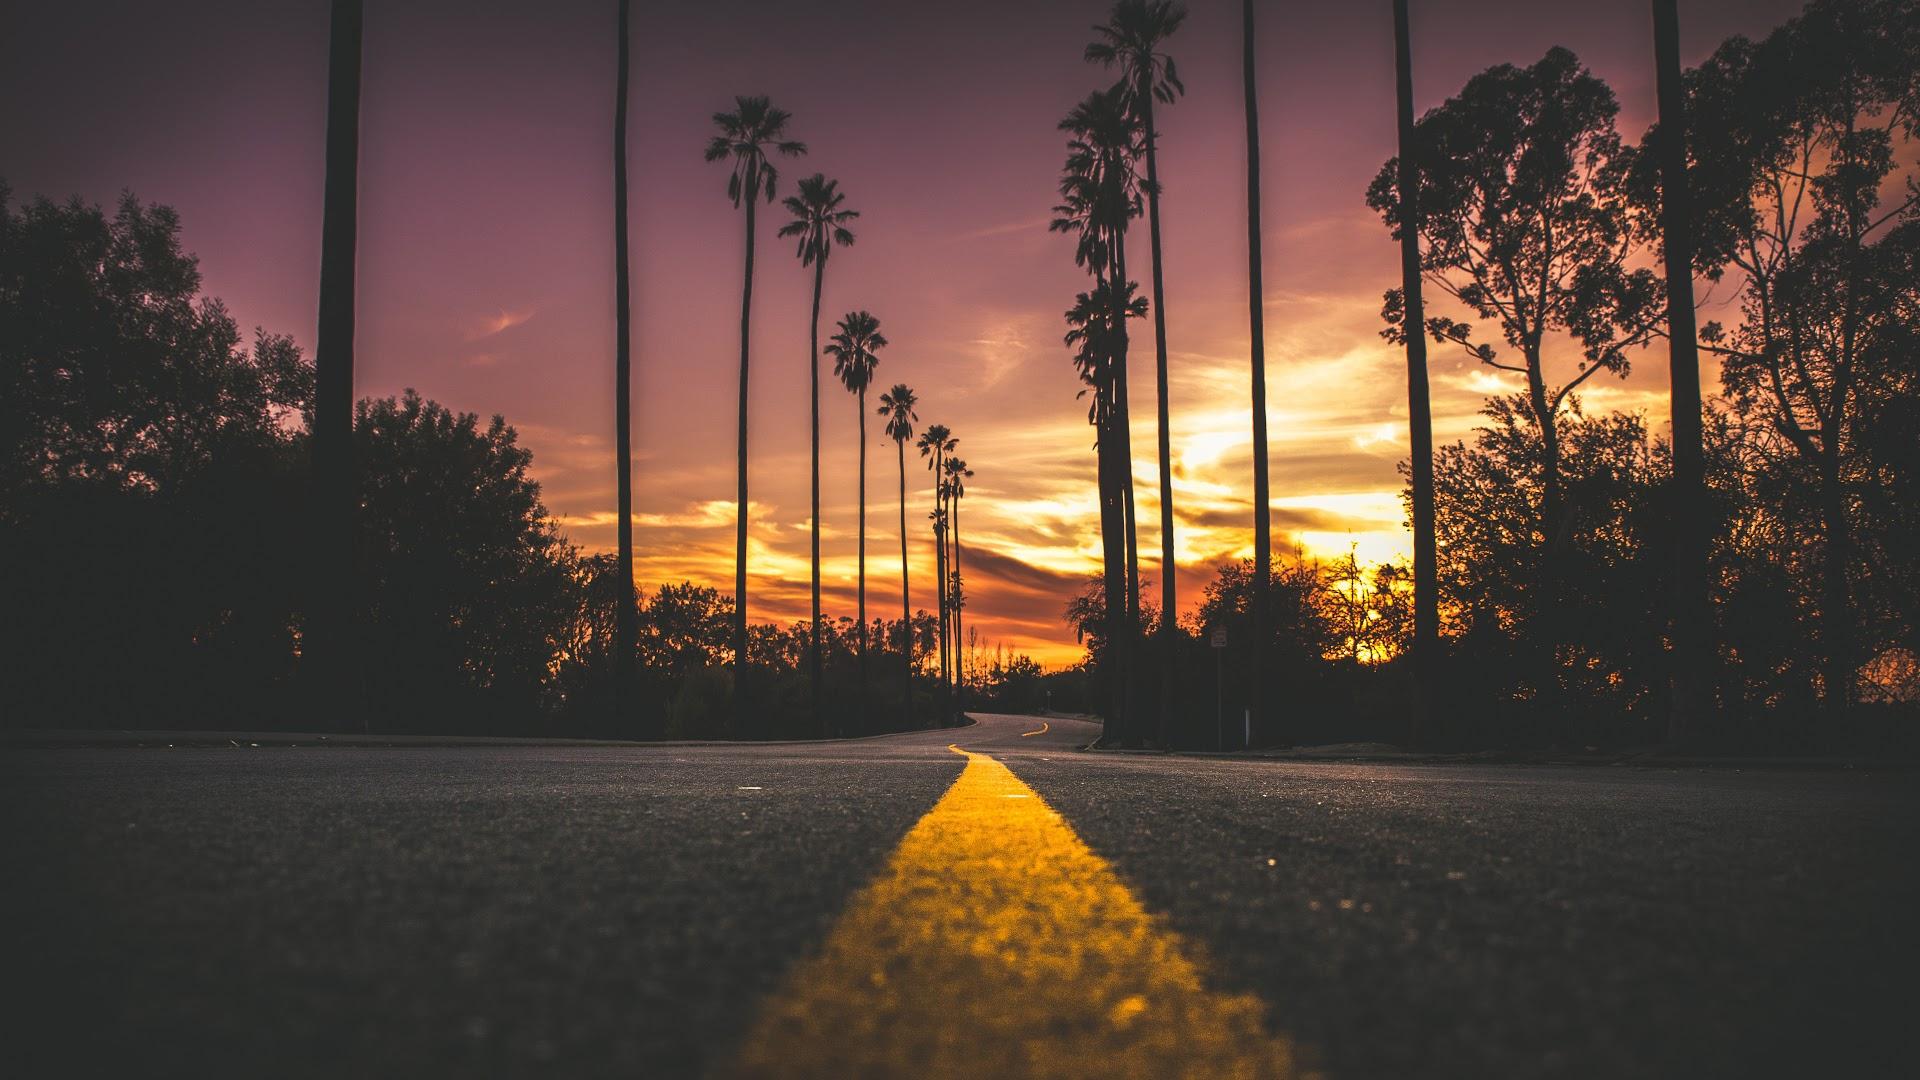 Sunset, Road, Landscape, Scenery, 4k, - Palm Tree Road Background - HD Wallpaper